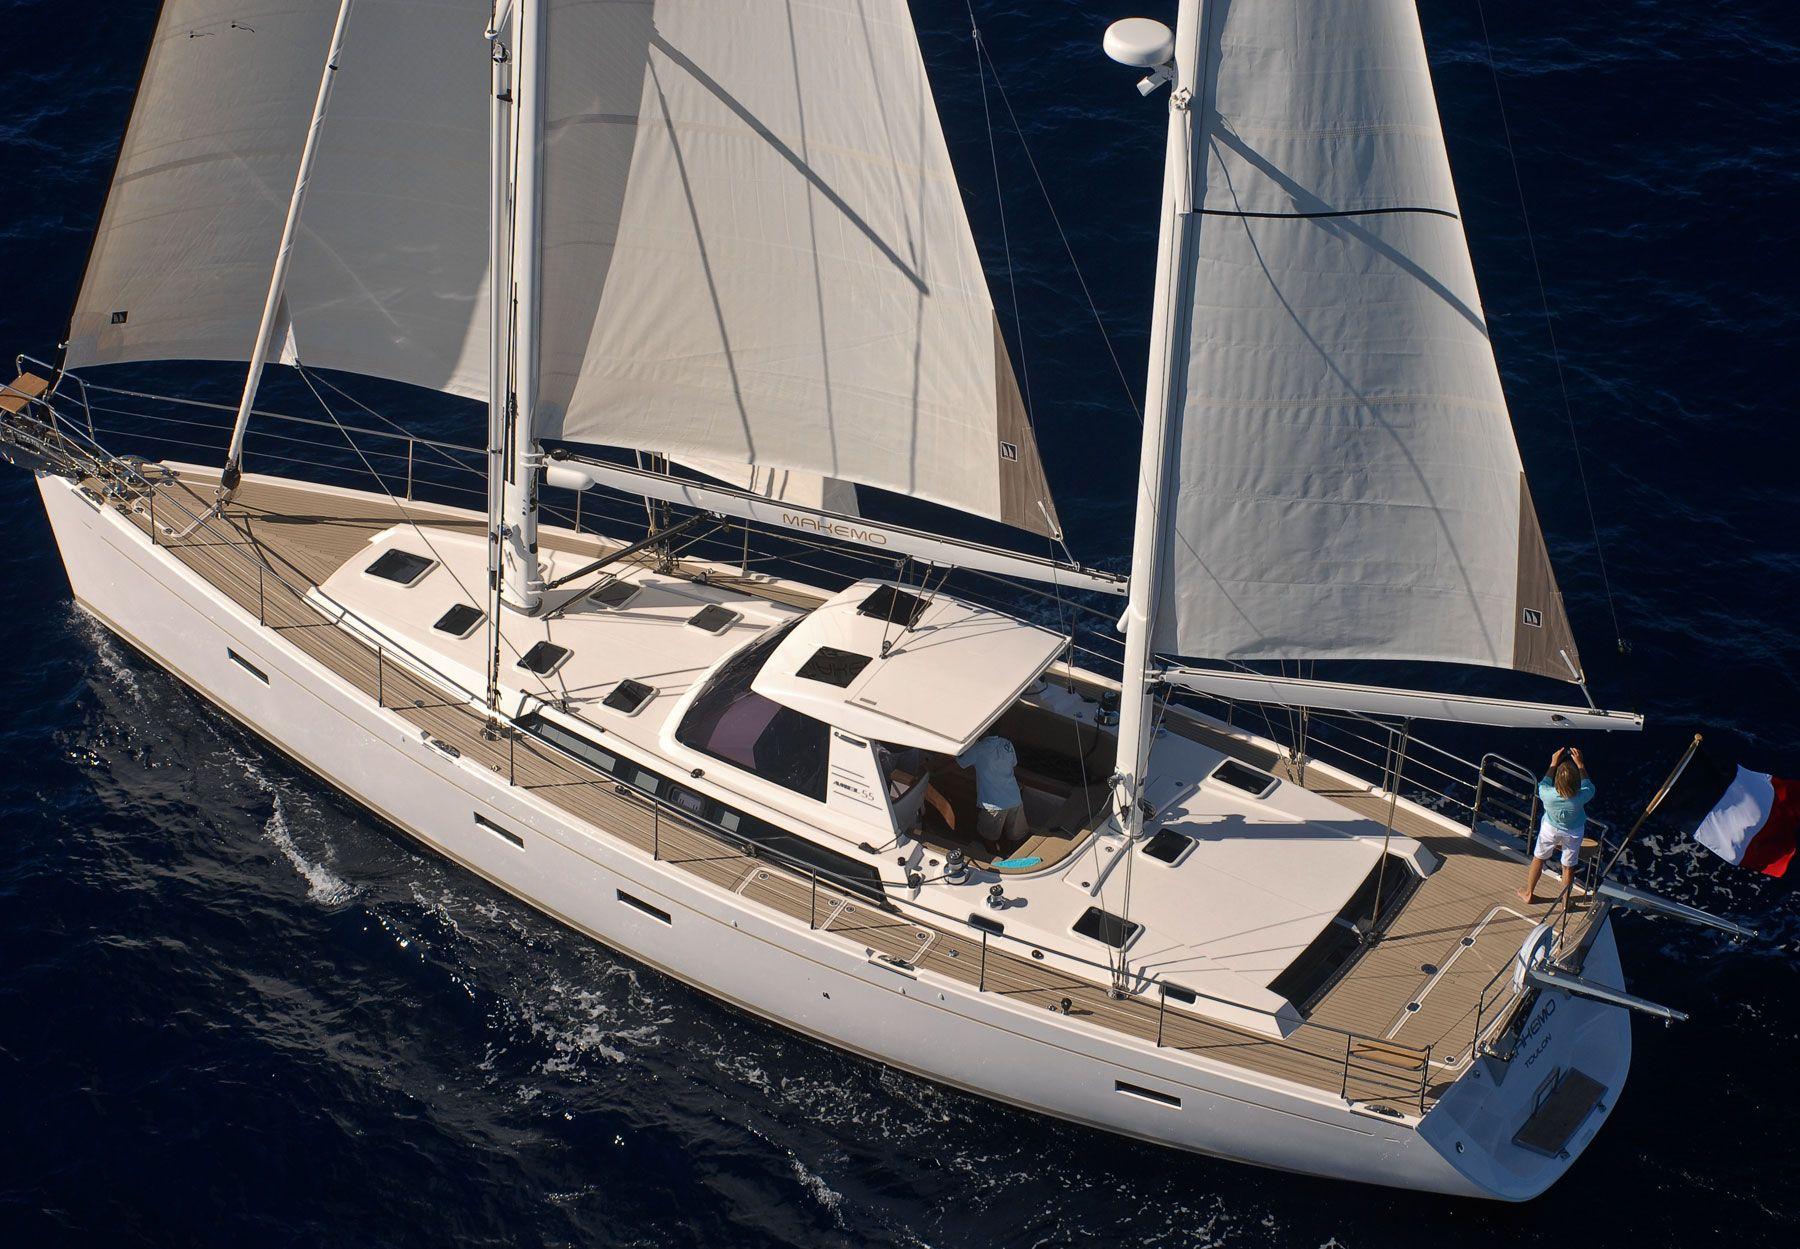 AMEL 55 | Sweet Boats | Boat, Amel yachts, Yacht design